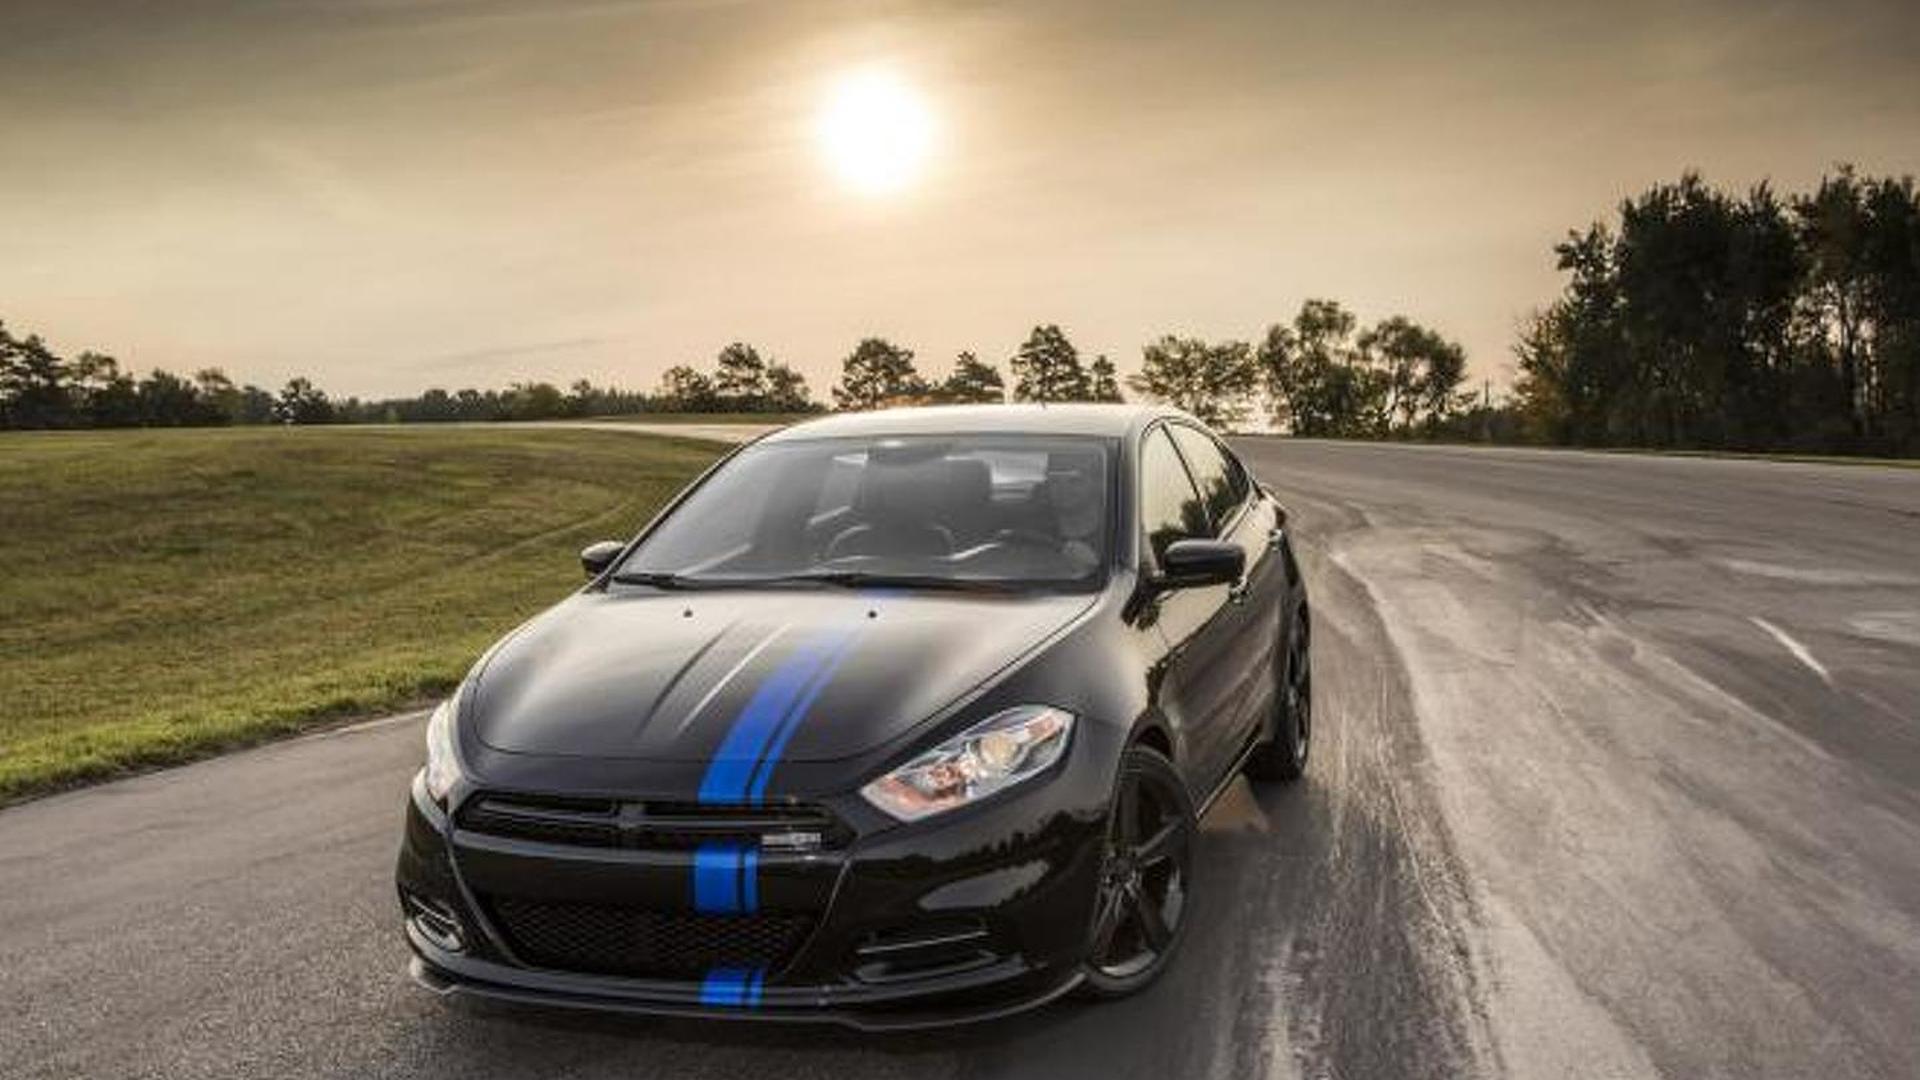 2013 Dodge Dart Mopar revealed ahead of Chicago Auto Show